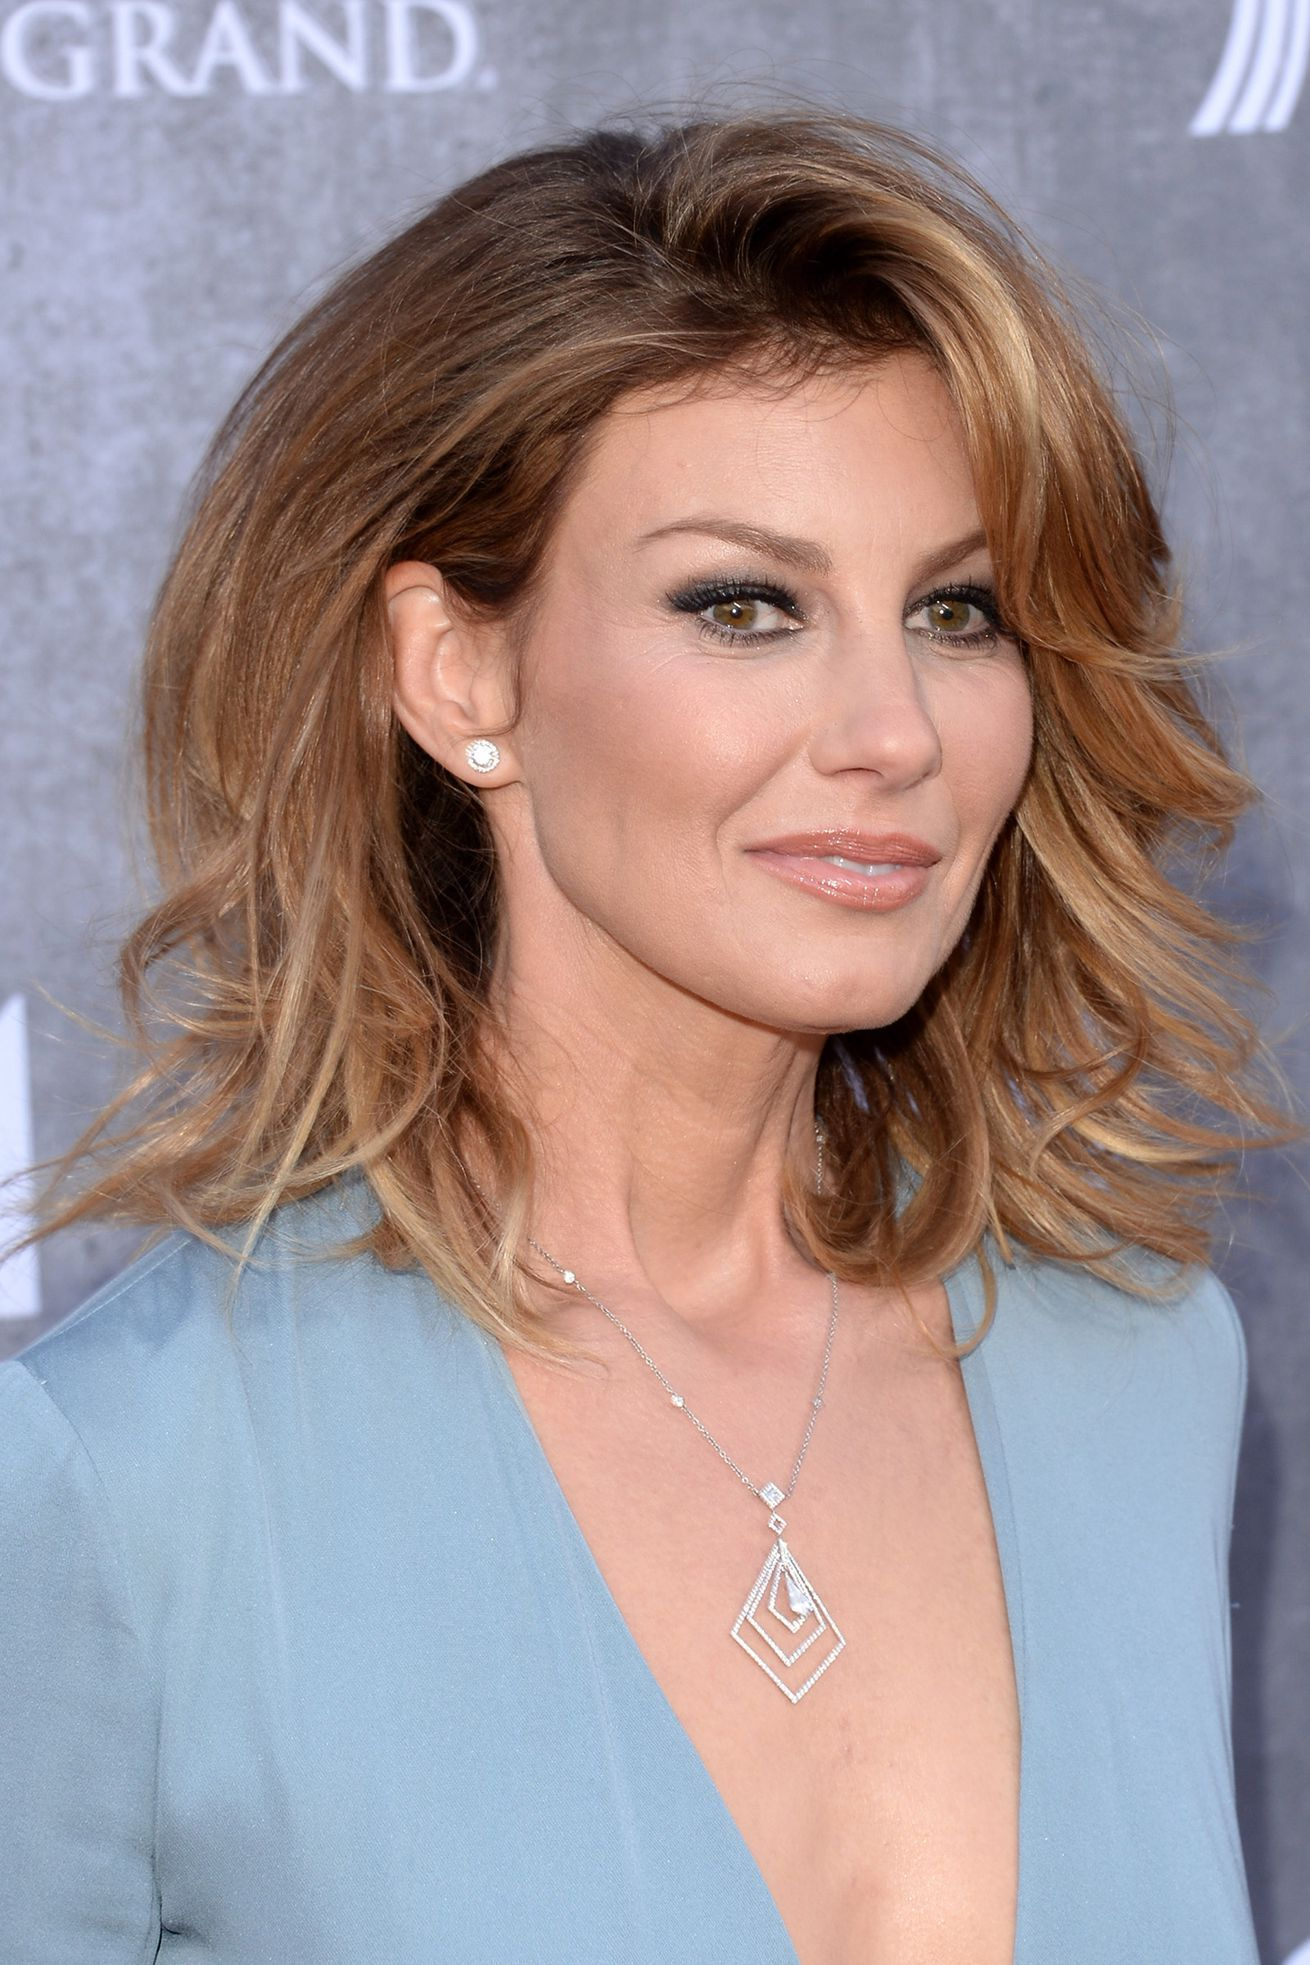 41 stunning celebrityinspired hairstyles for women over